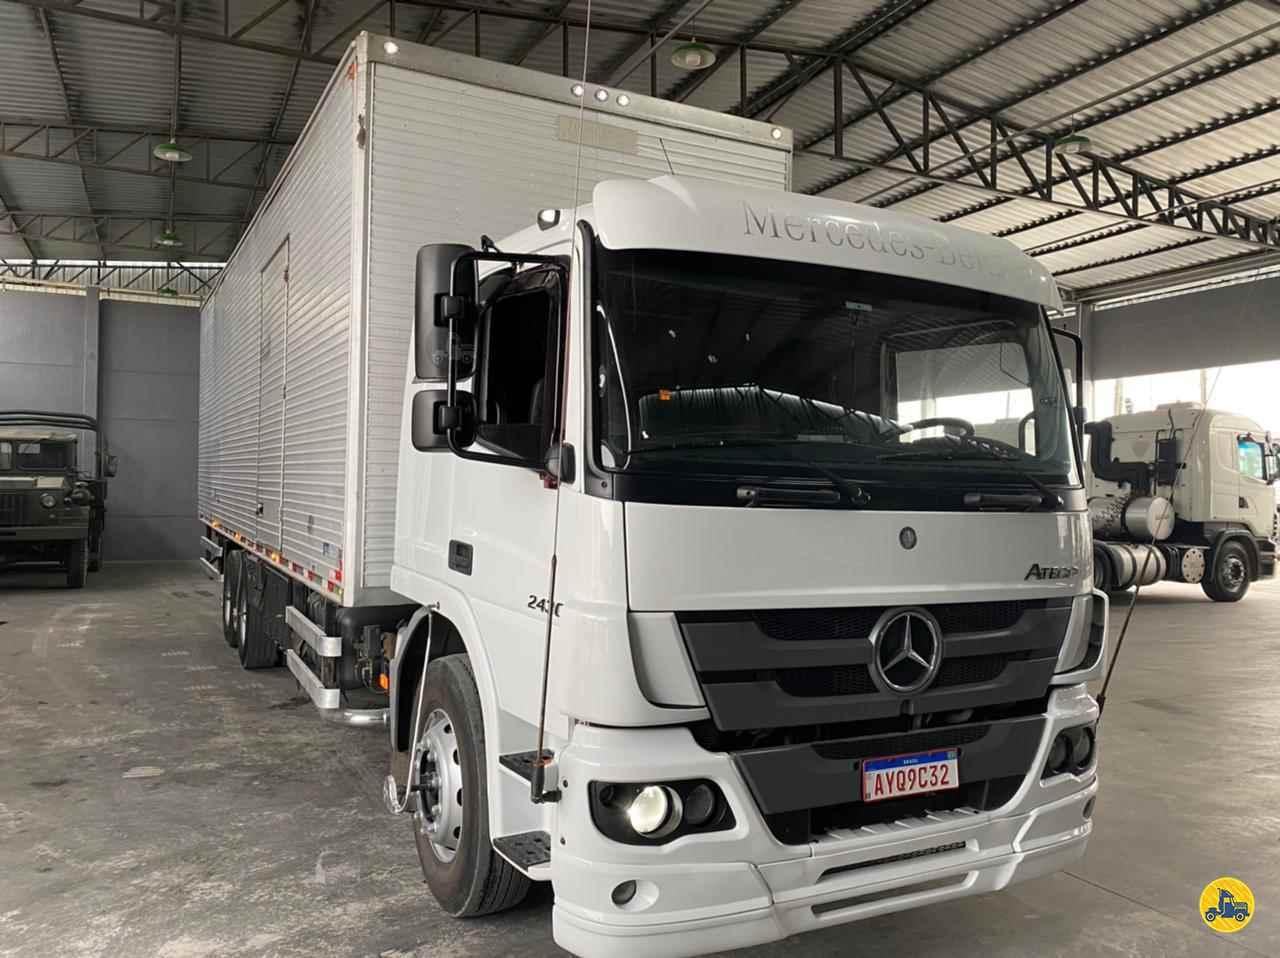 MB 2430 de Rodricardo Caminhões - COLOMBO/PR